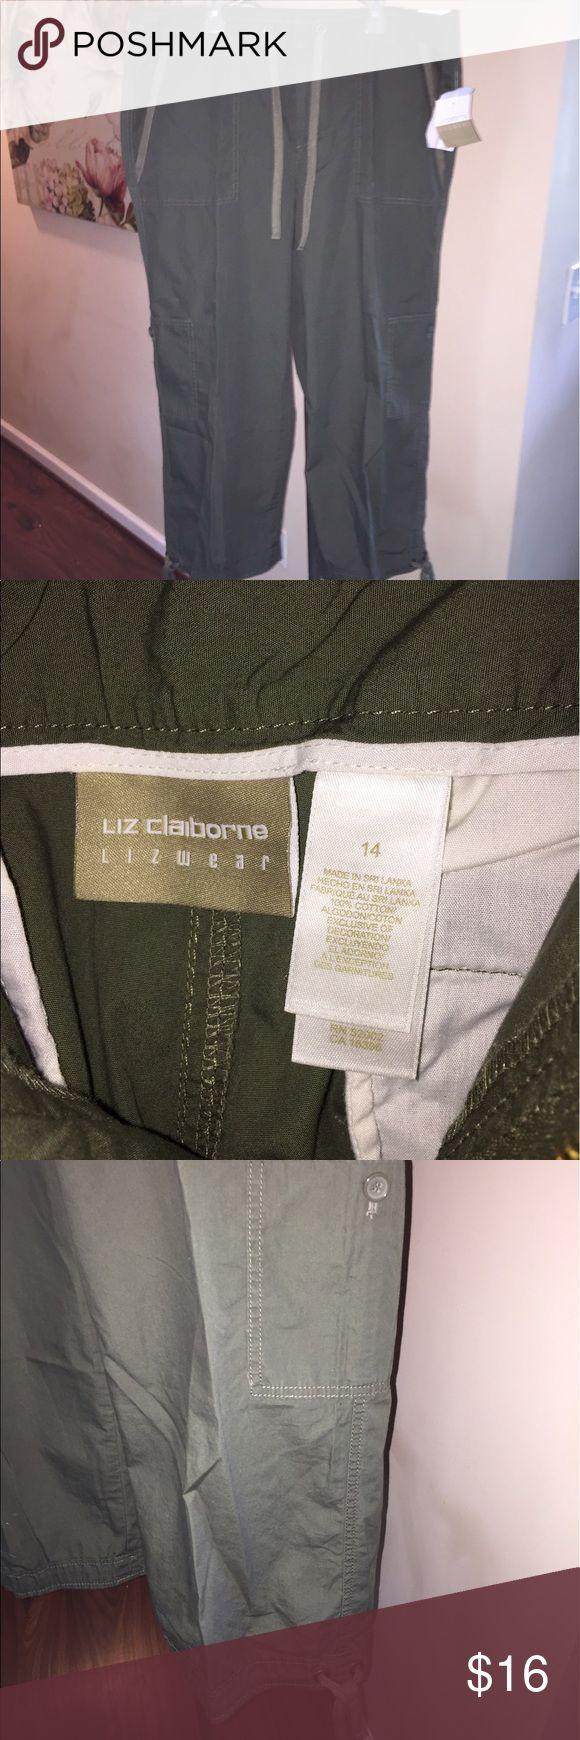 Lizwear green khaki capris New Lizwear green khaki capris with cargo pockets and ties at legs. Sz 14. Cotton. Zip front and tie. Liz Claiborne Pants Capris